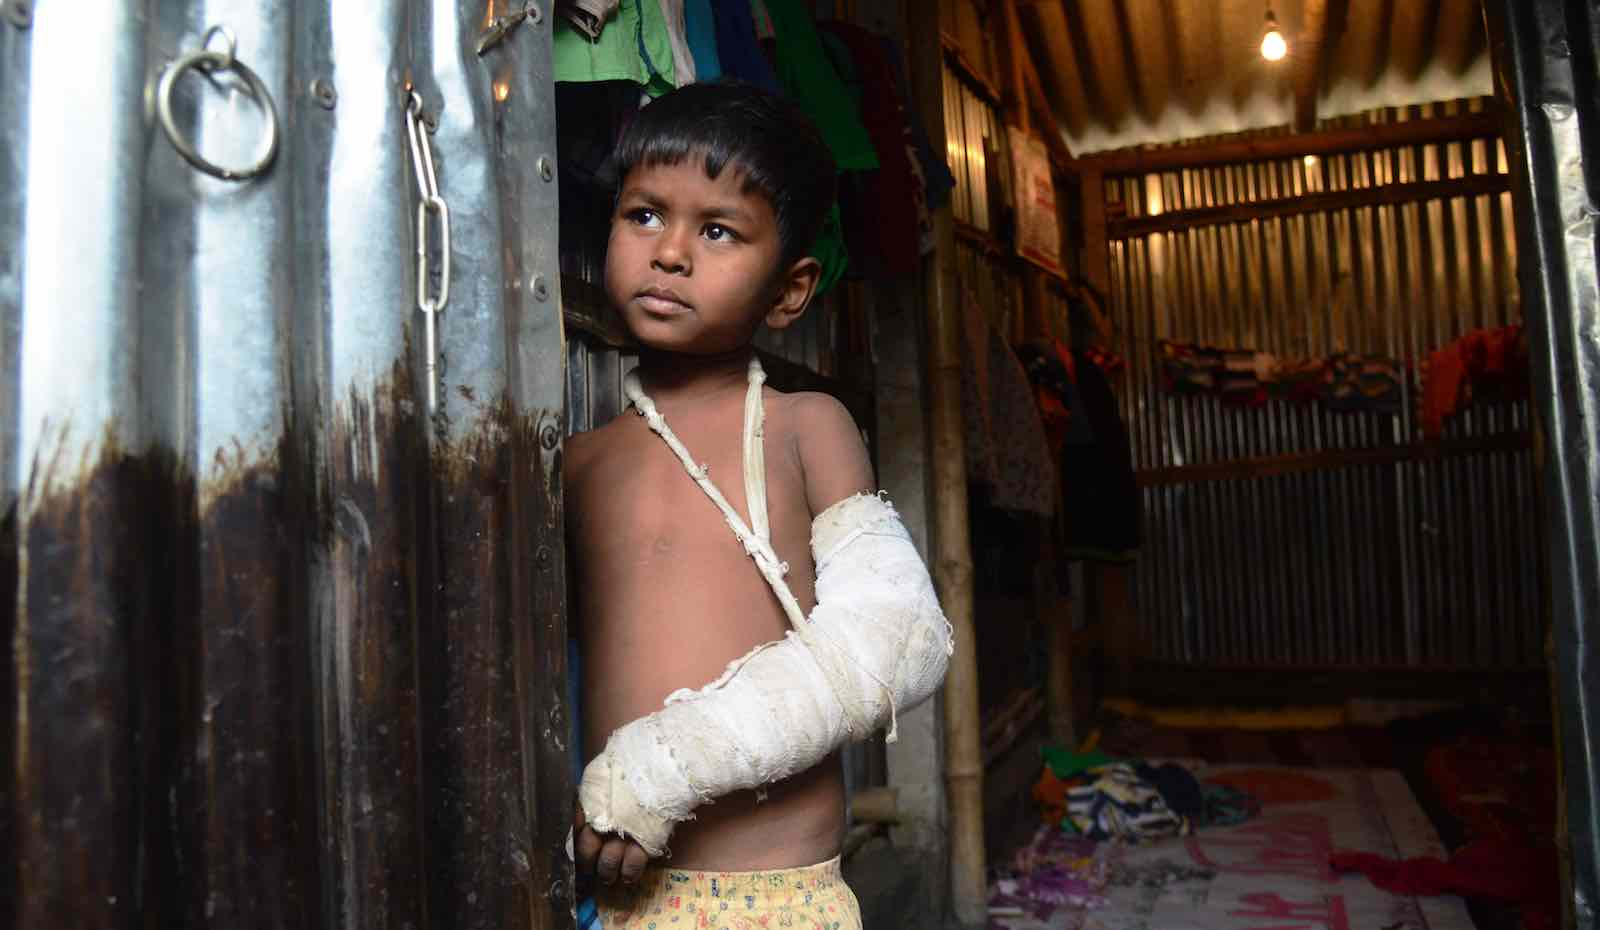 Temporary shelter for Rohingya refugees south of Kolkata, India, in January (Photo: Dibyangshu Sarkar via Getty)